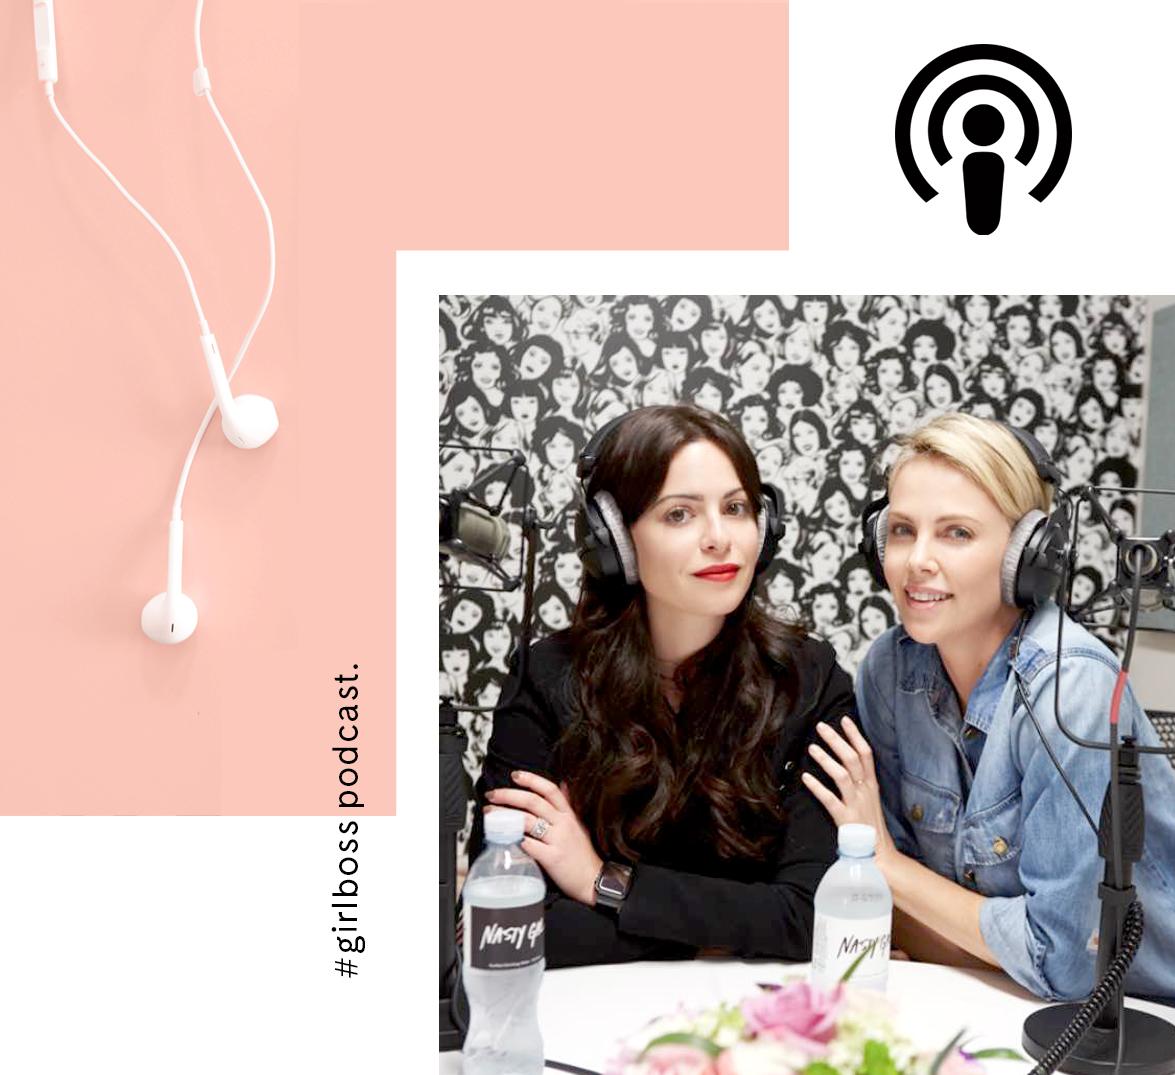 #girlboss radio